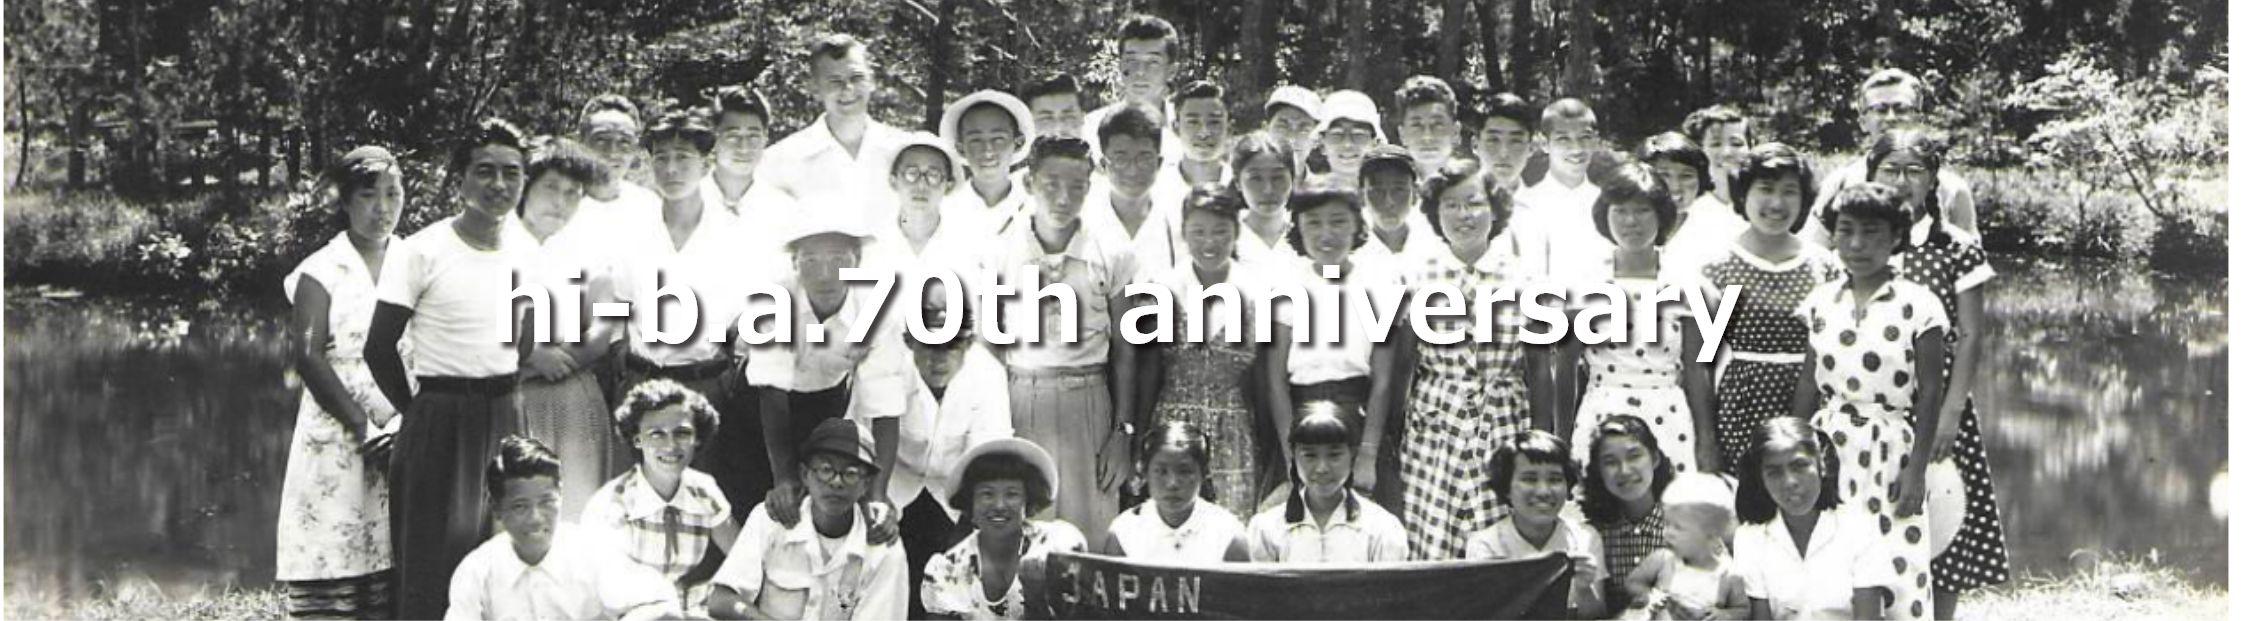 hi-b.a.70th anniversary